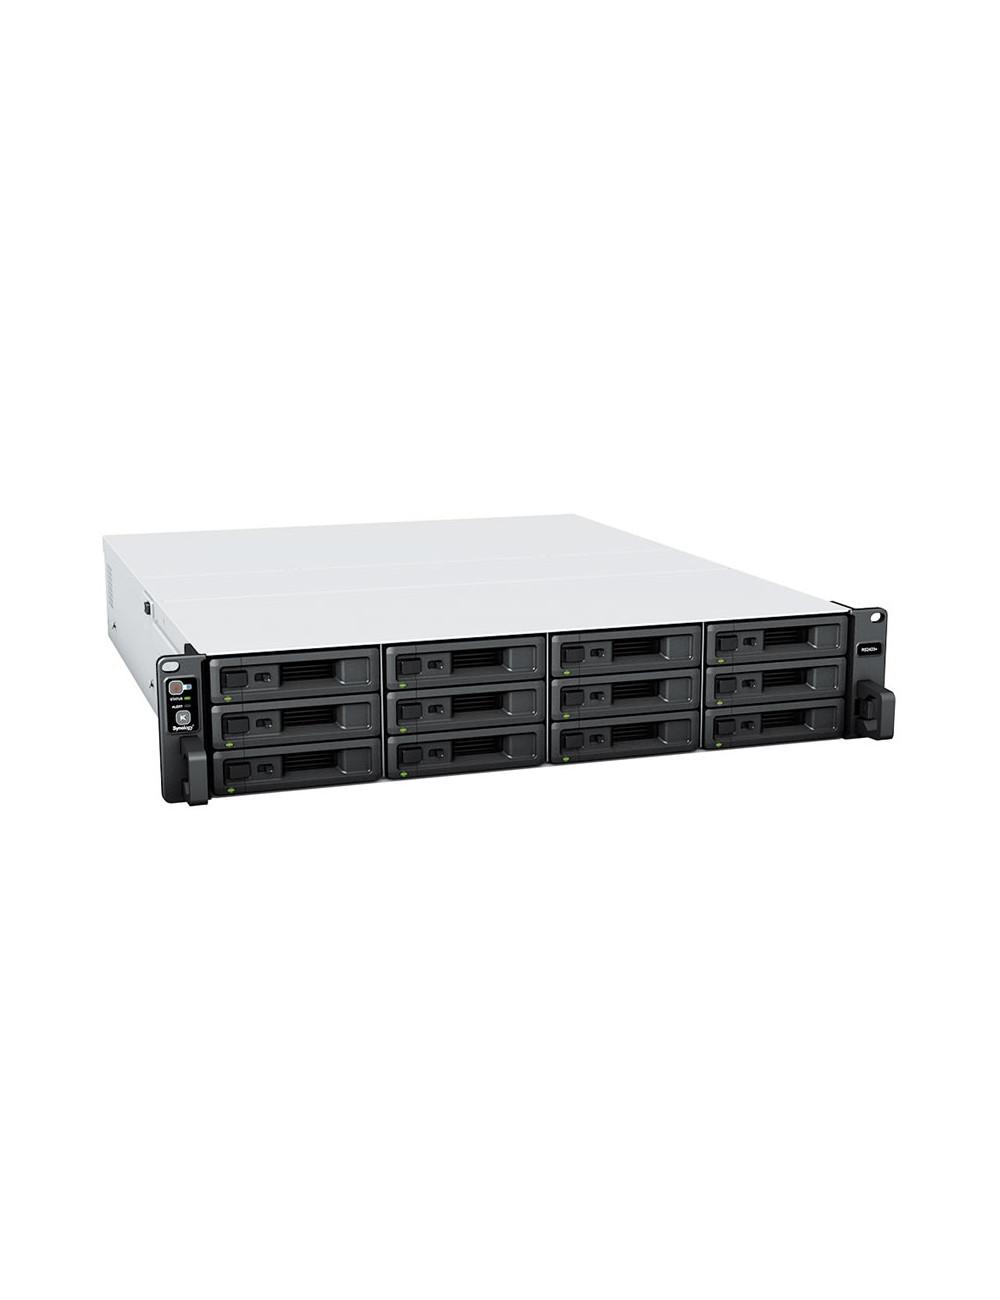 Synology DS218+ NAS Server IRONWOLF 8TB (2x4TB)